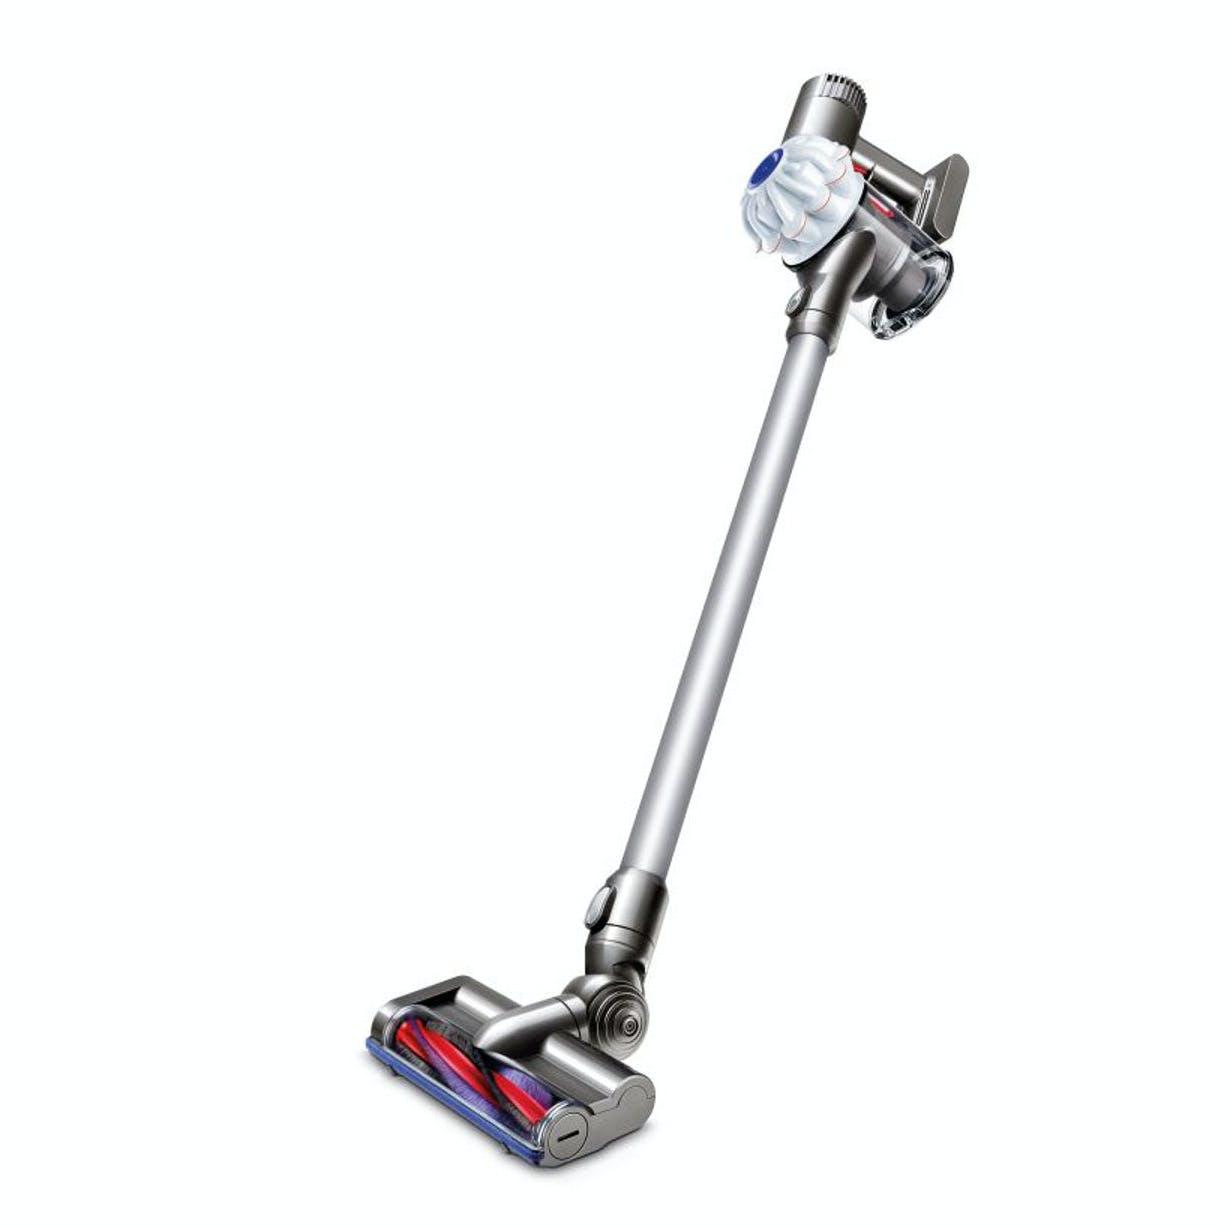 Dyson V6flexi V6 Handheld Amp Stick Vacuum With Flexible Tools